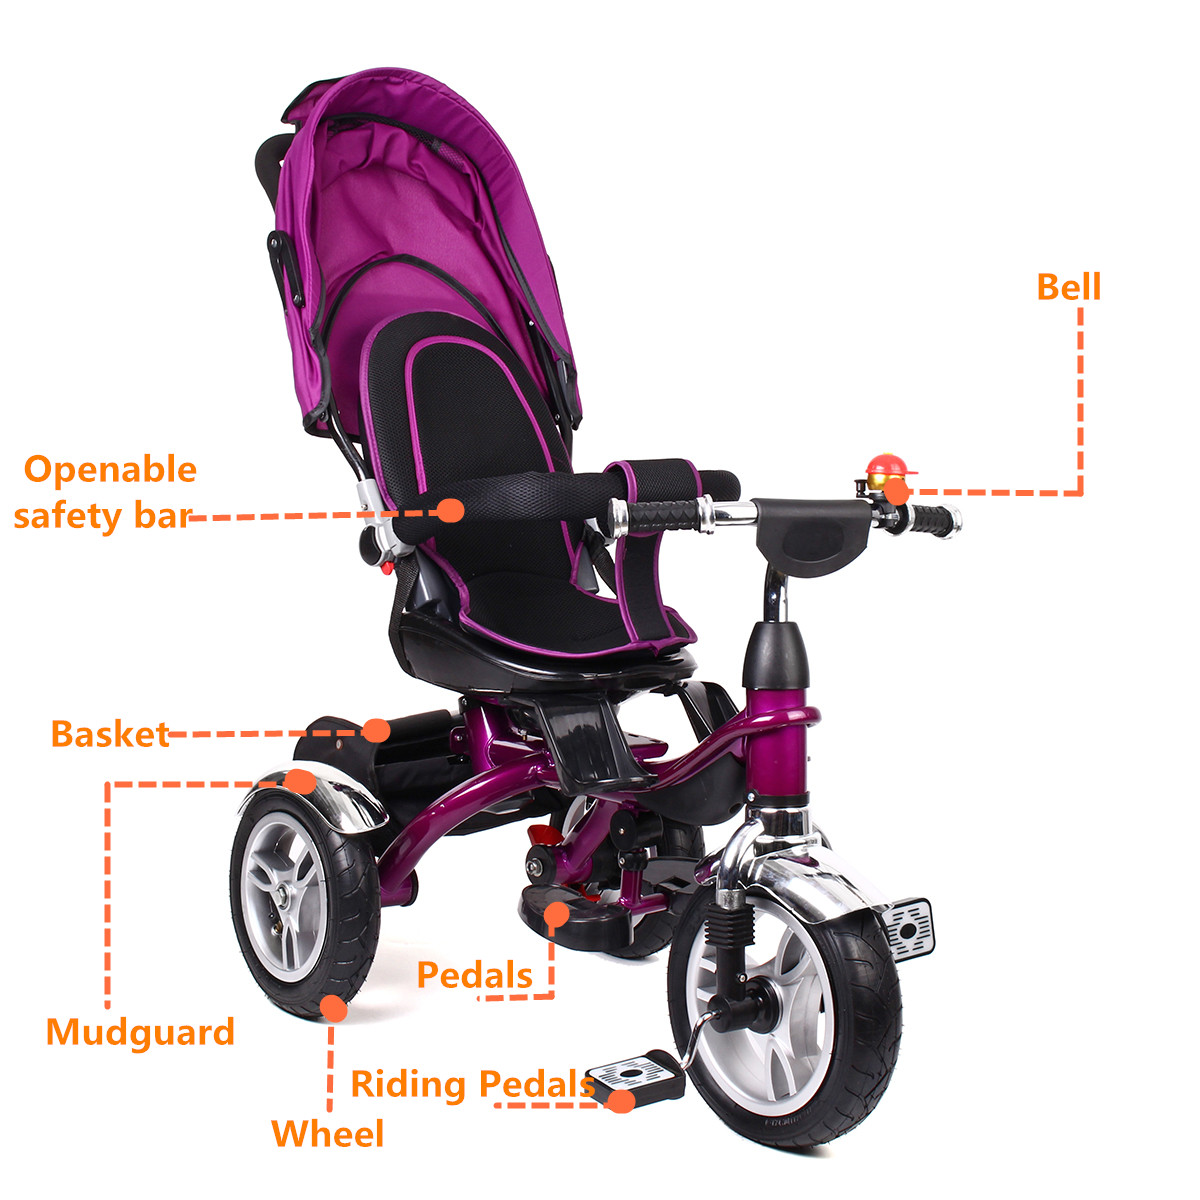 4 In 1 Baby Kids Reverse Toddler Tricycle Bike Trike Ride-On Toys Stroller Prams